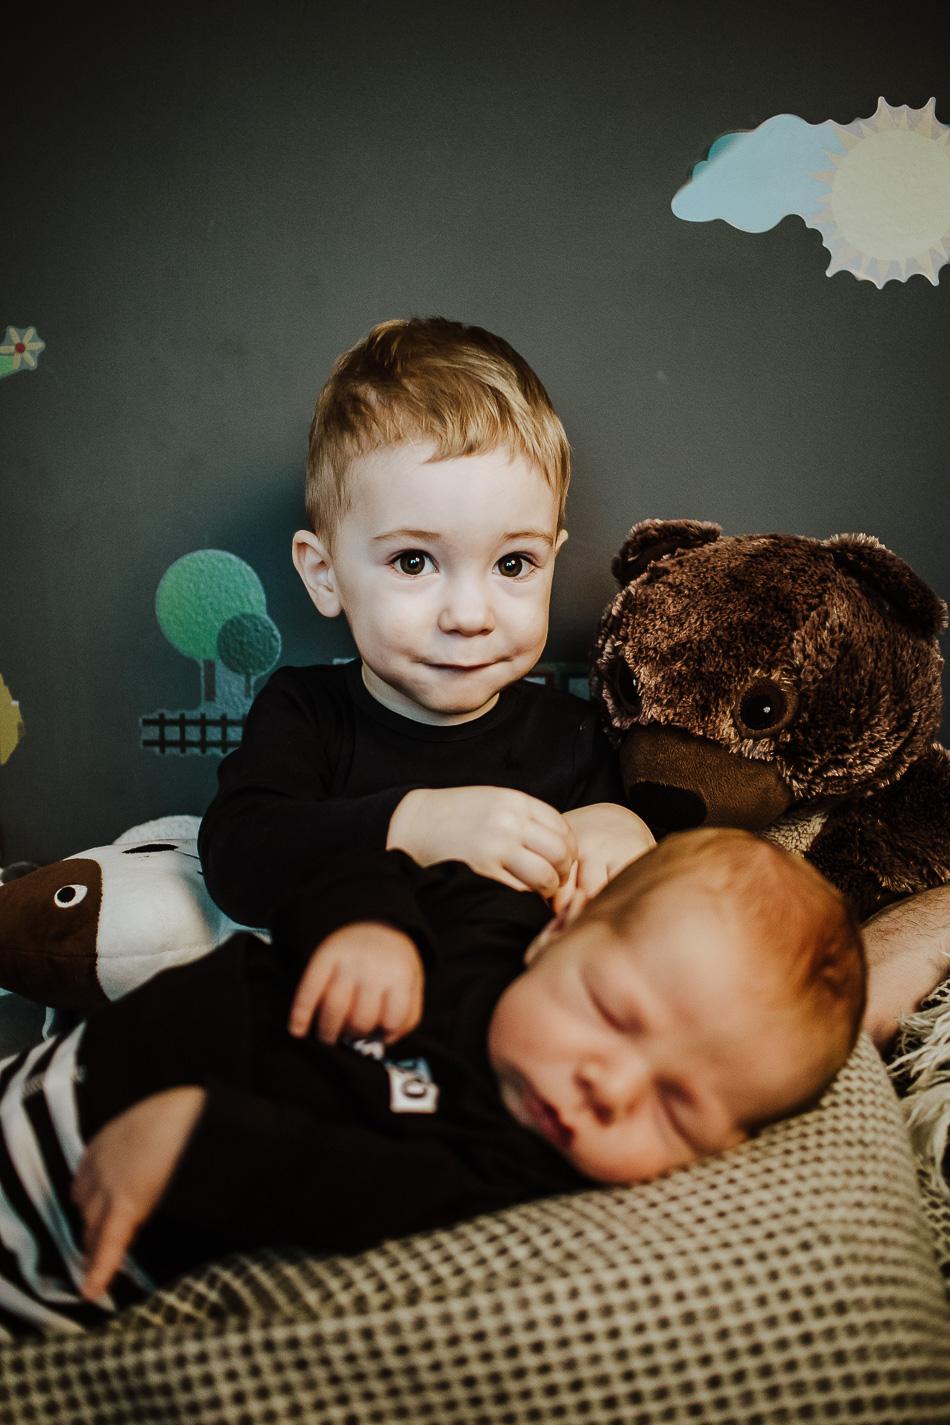 fotograf profesionist targu mures nunta familie newborn familie nou nascuti botez fotografie creativa imaginii naturale autentice